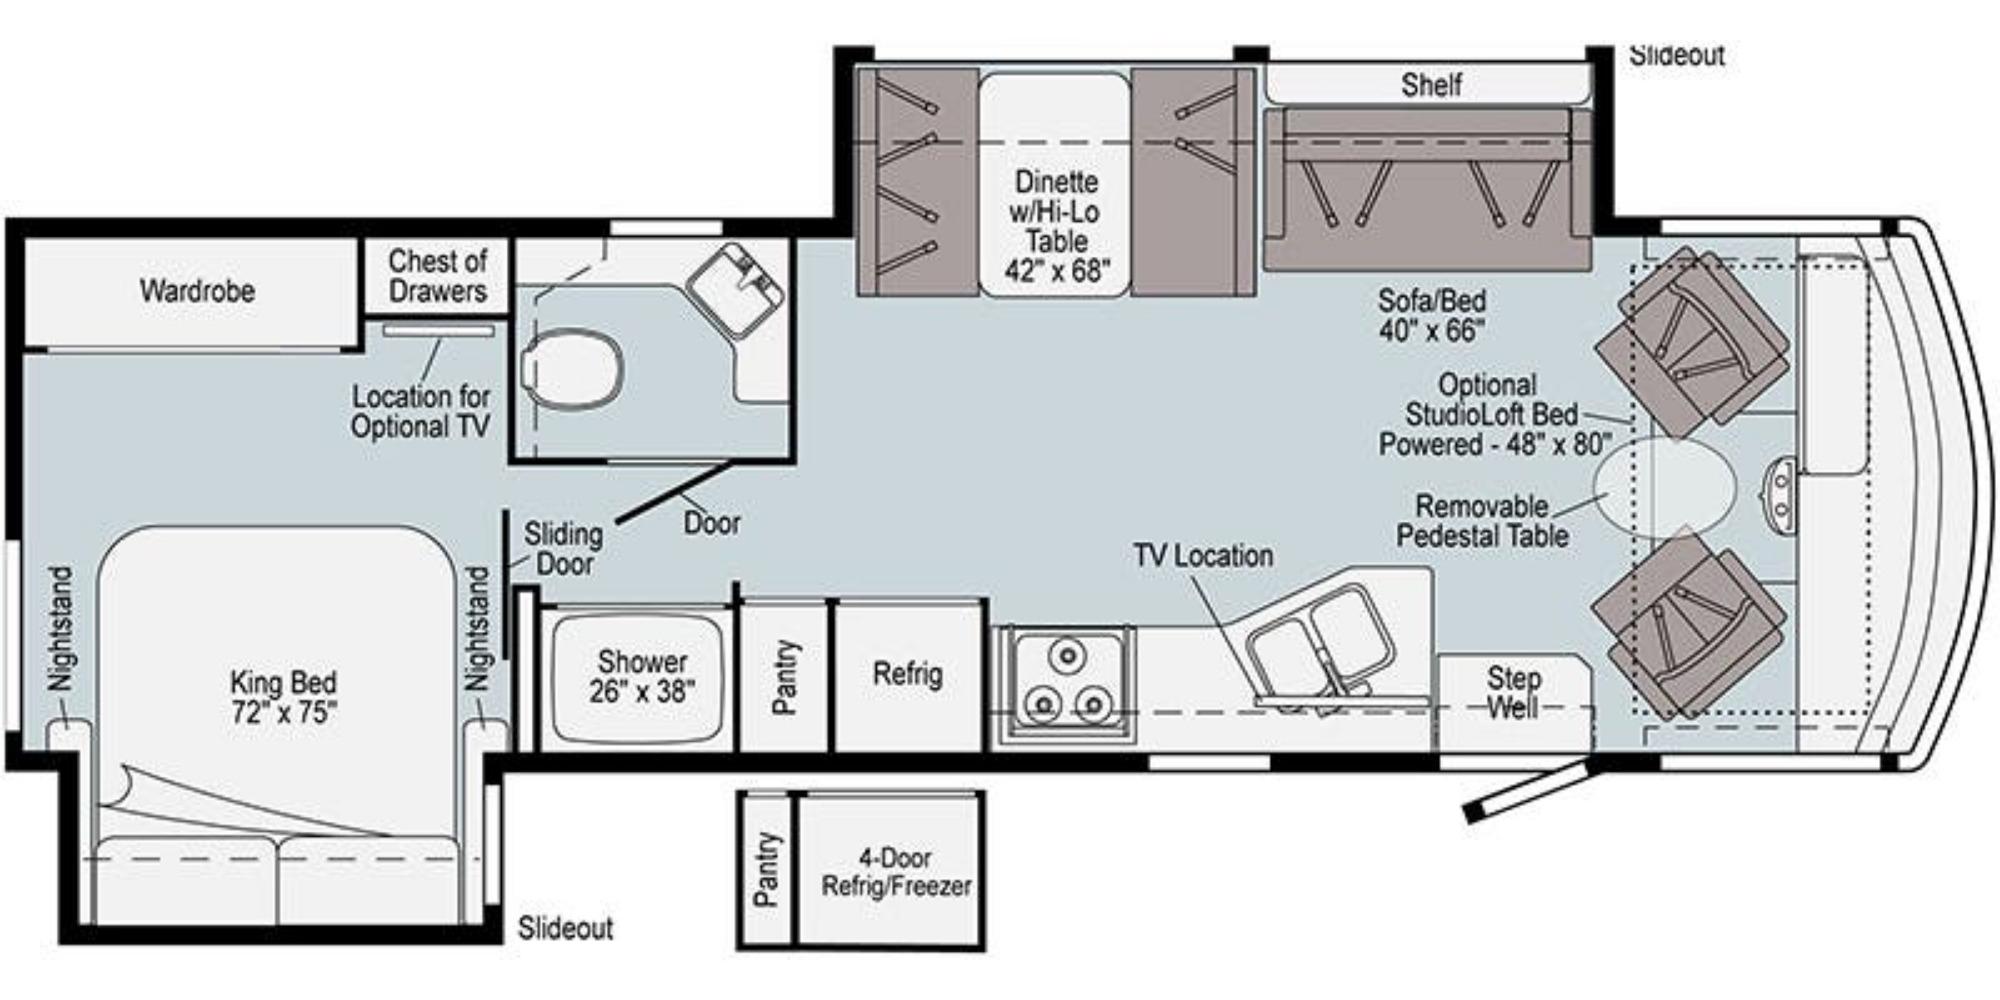 View Floor Plan for 2021 WINNEBAGO VISTA 32M